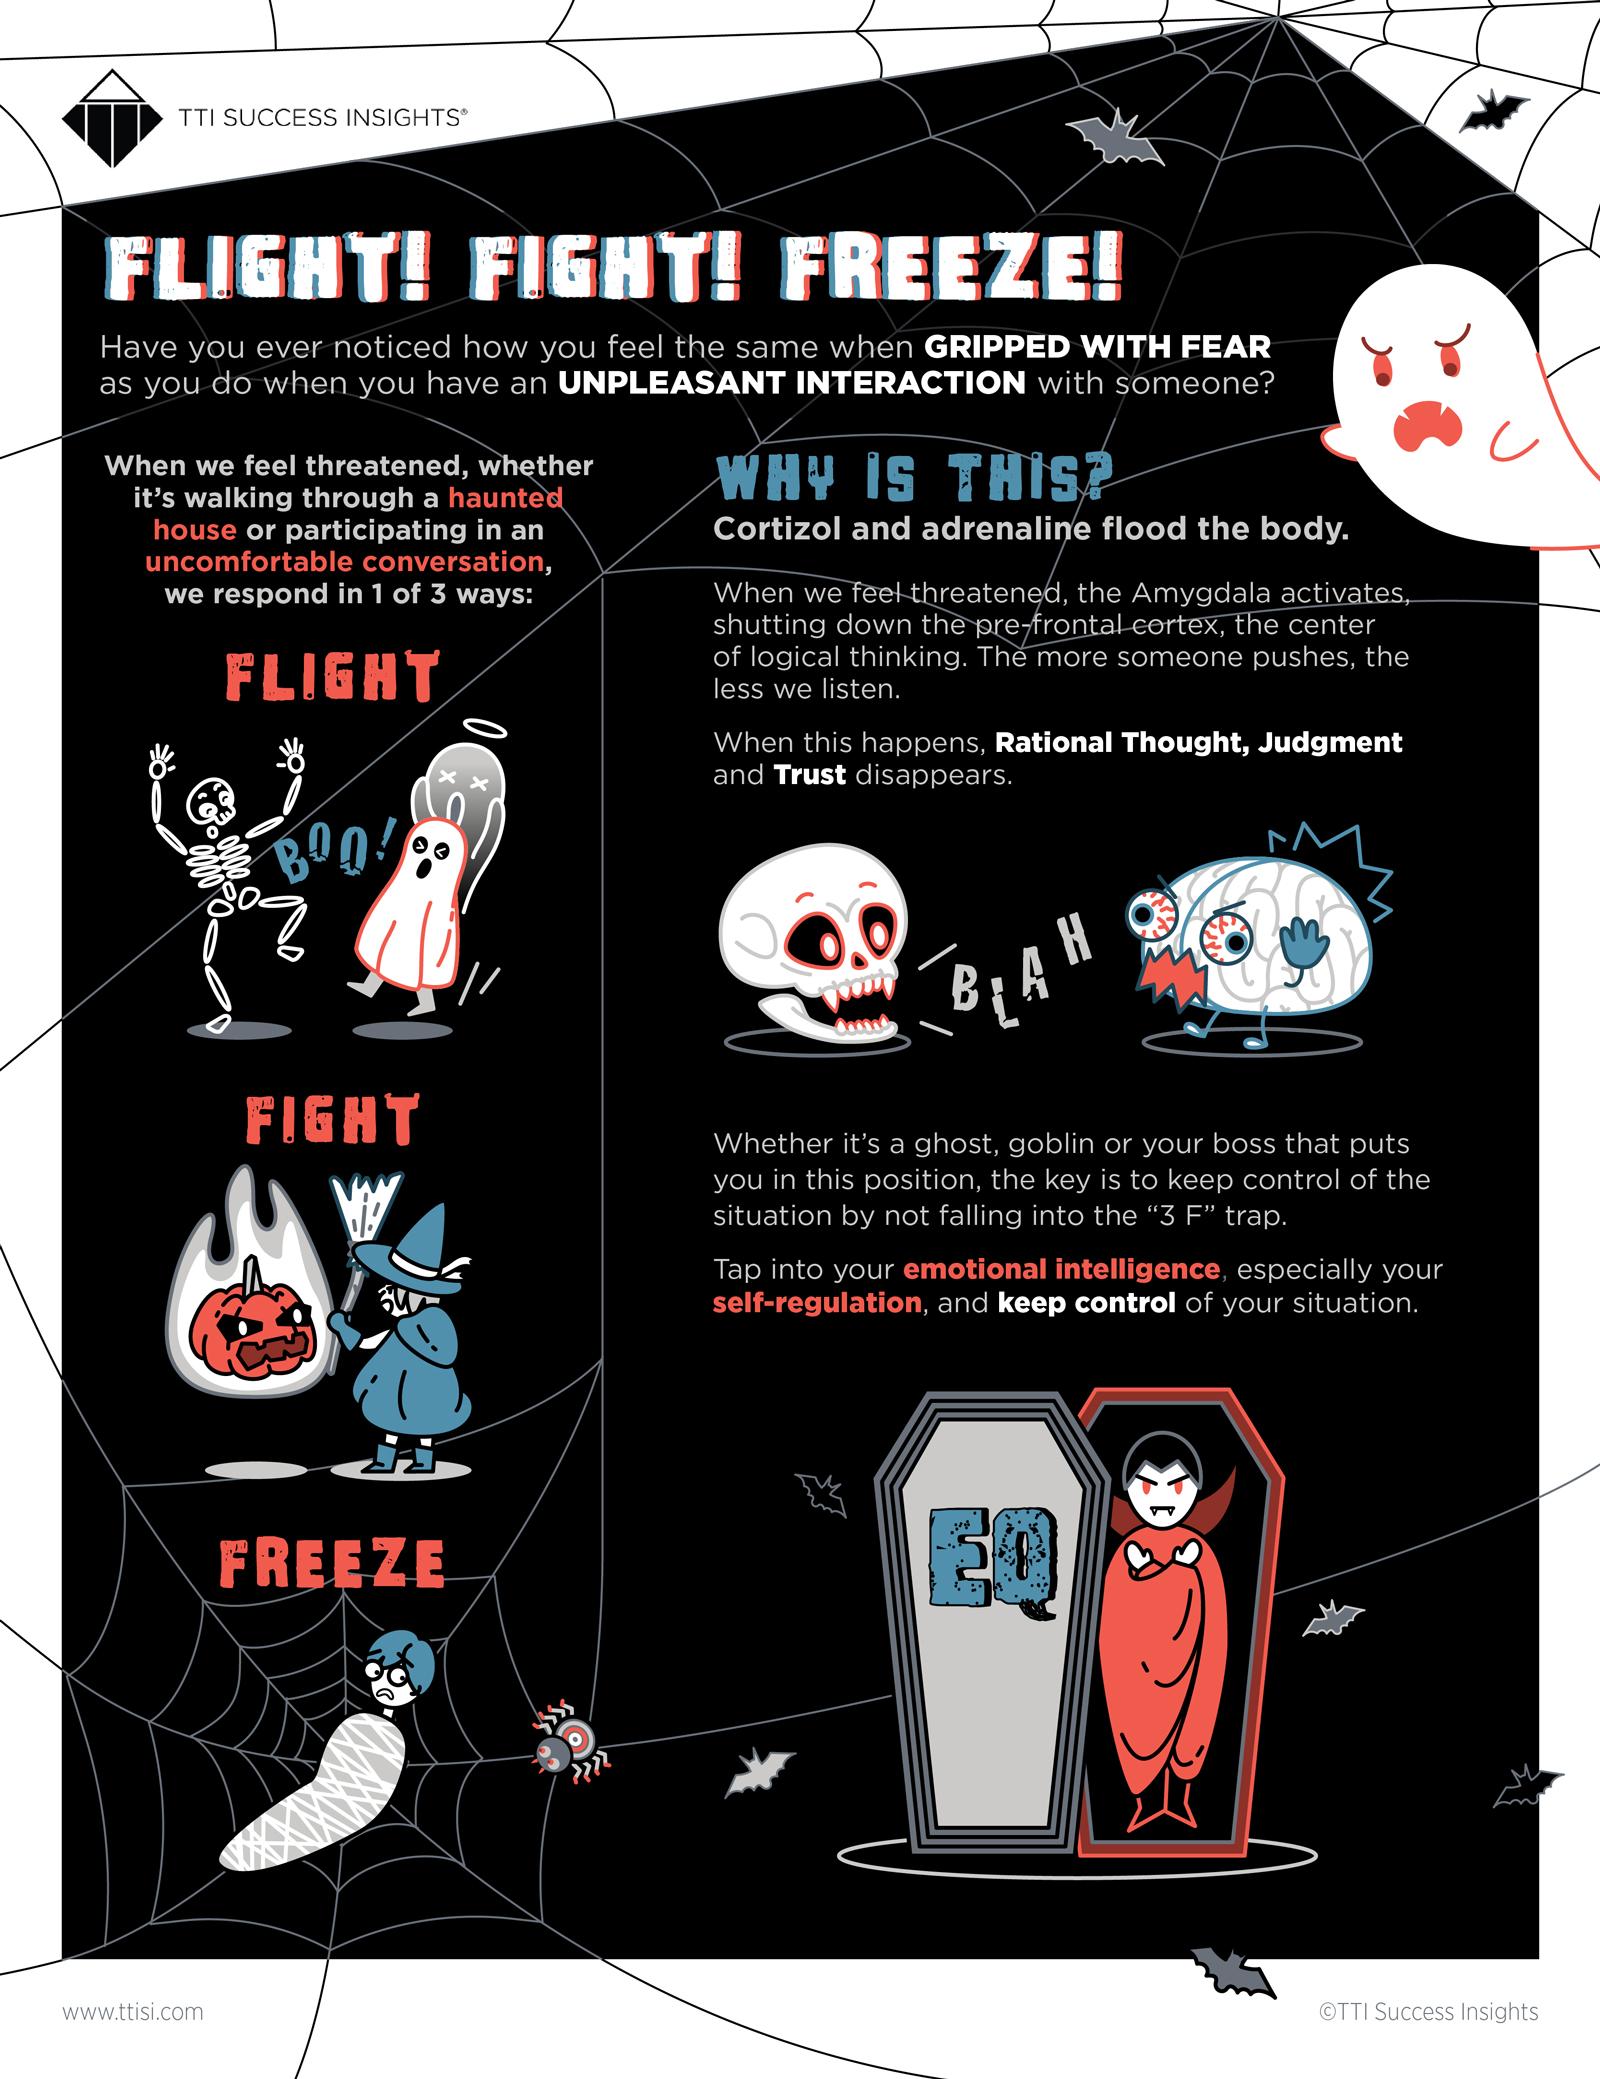 infographic_oct_2019_flight_fight_freeze